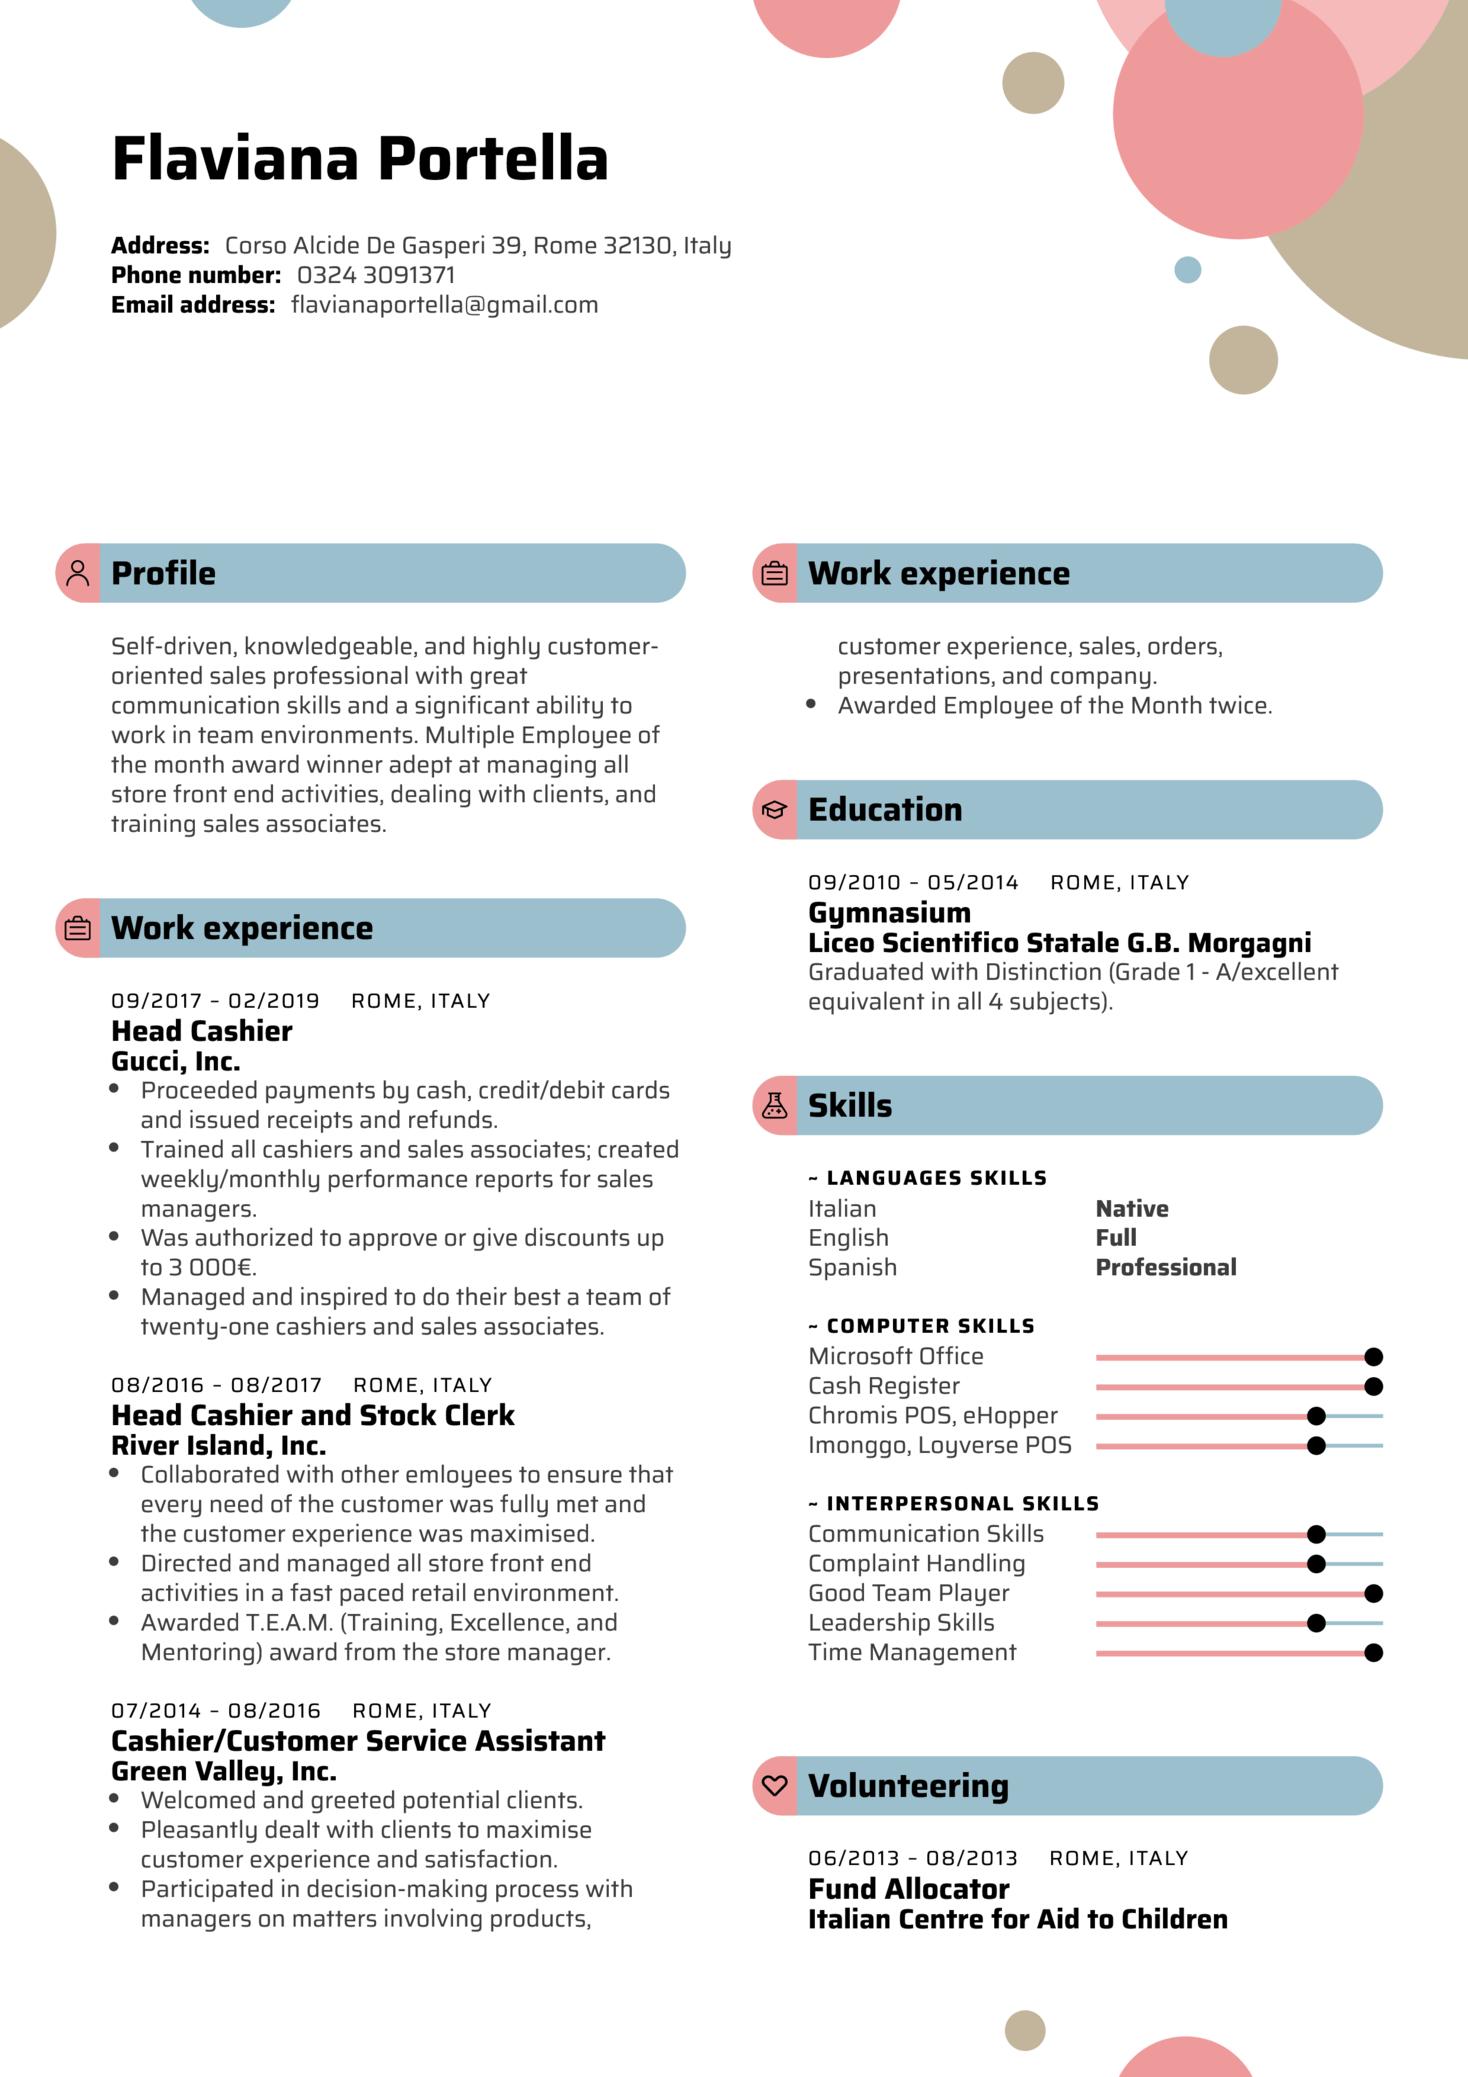 Head Cashier Resume Template (parte 1)